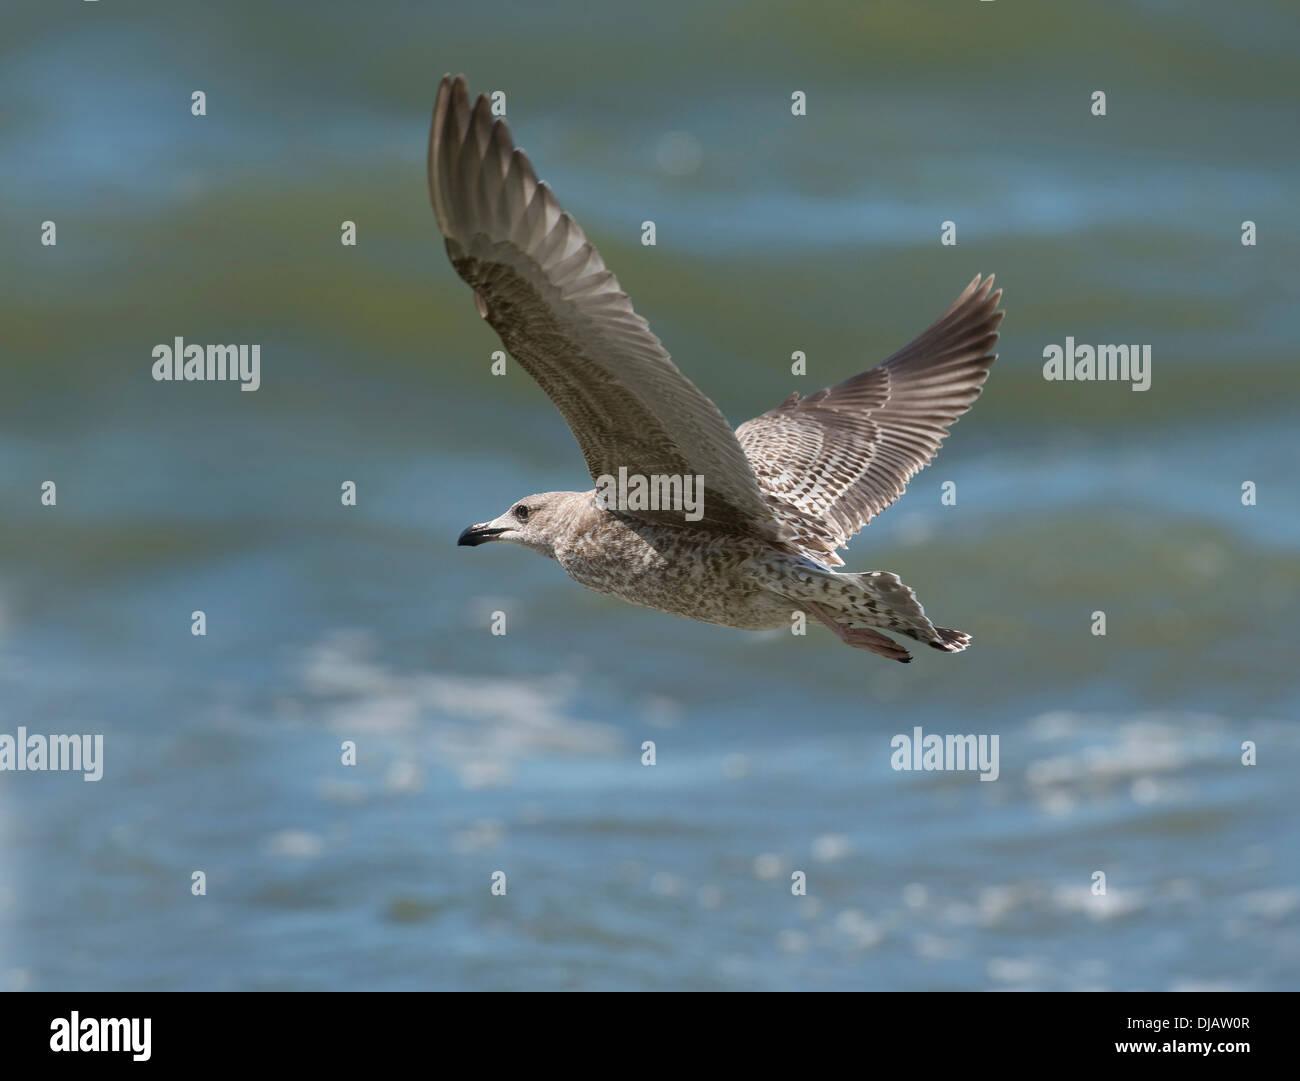 Herring Gull (Larus argentatus) in flight, Mecklenburg-Western Pomerania, Germany - Stock Image